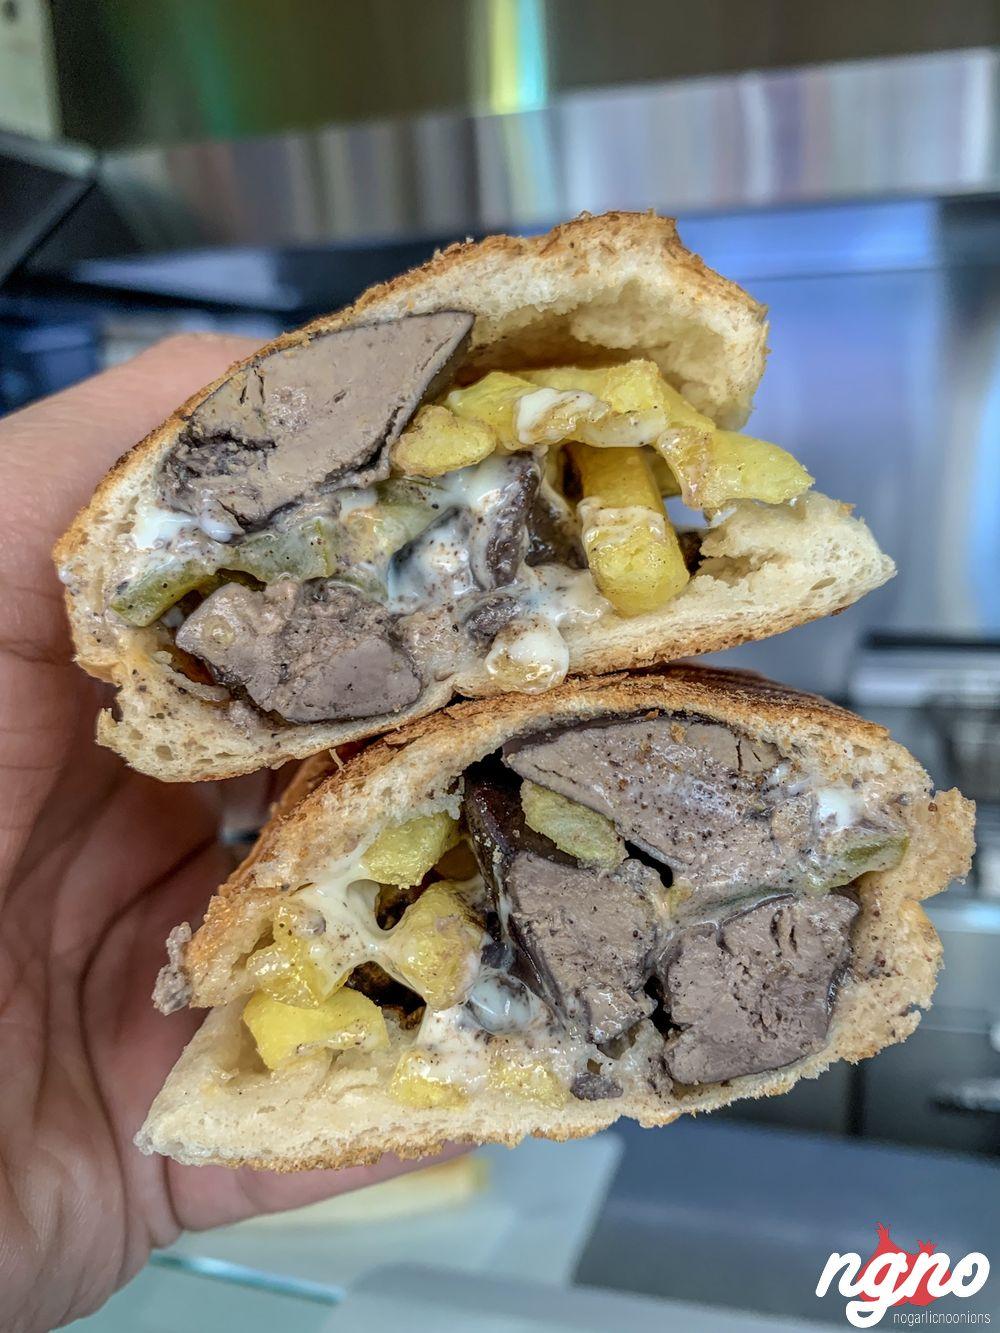 j-makhlouf-dora-sandwiches-nogarlicnoonions-162019-02-22-09-49-24